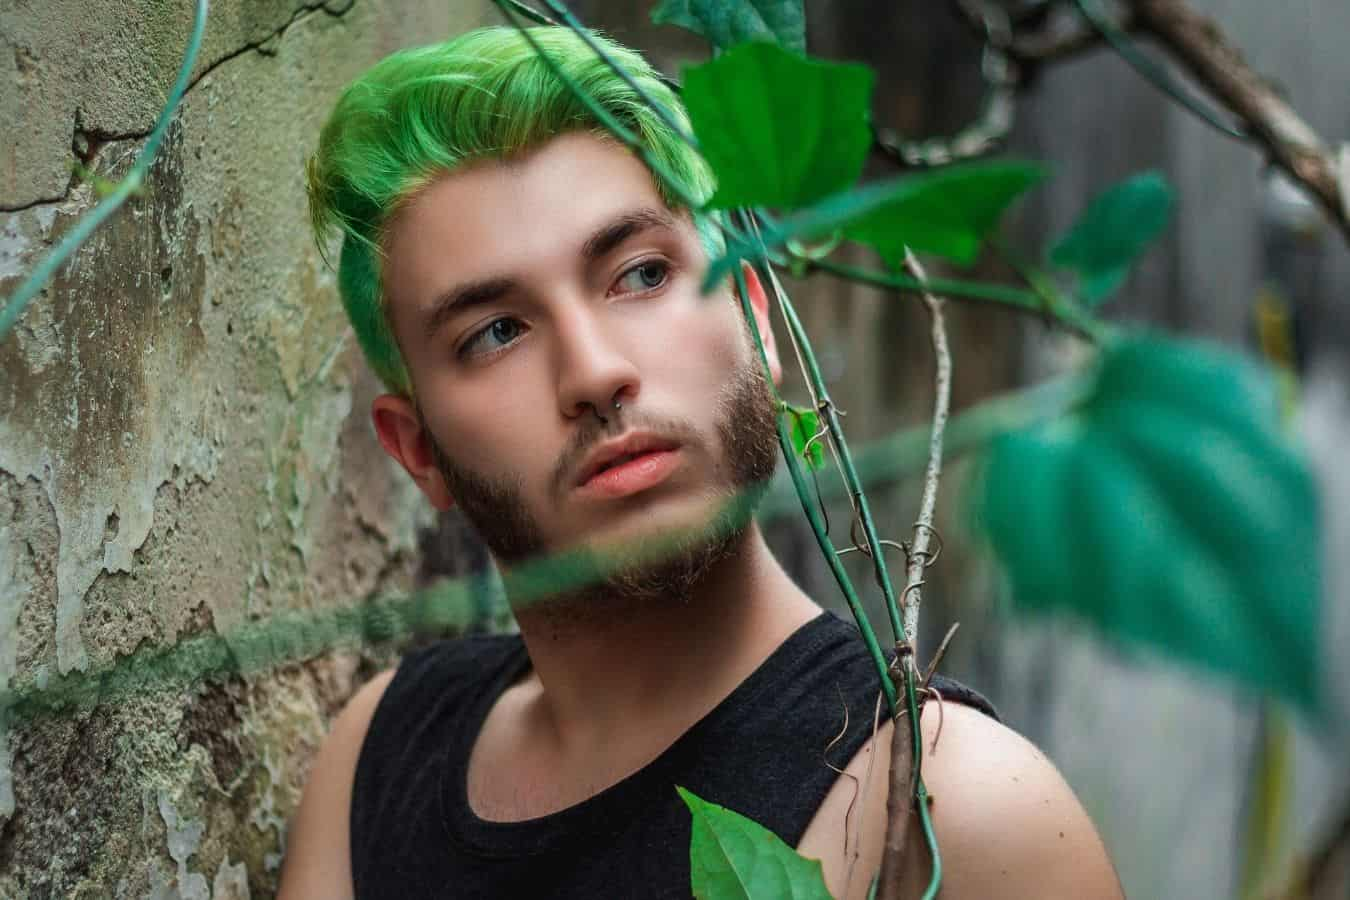 Do I Need Bleach To Remove Green Hair Dye